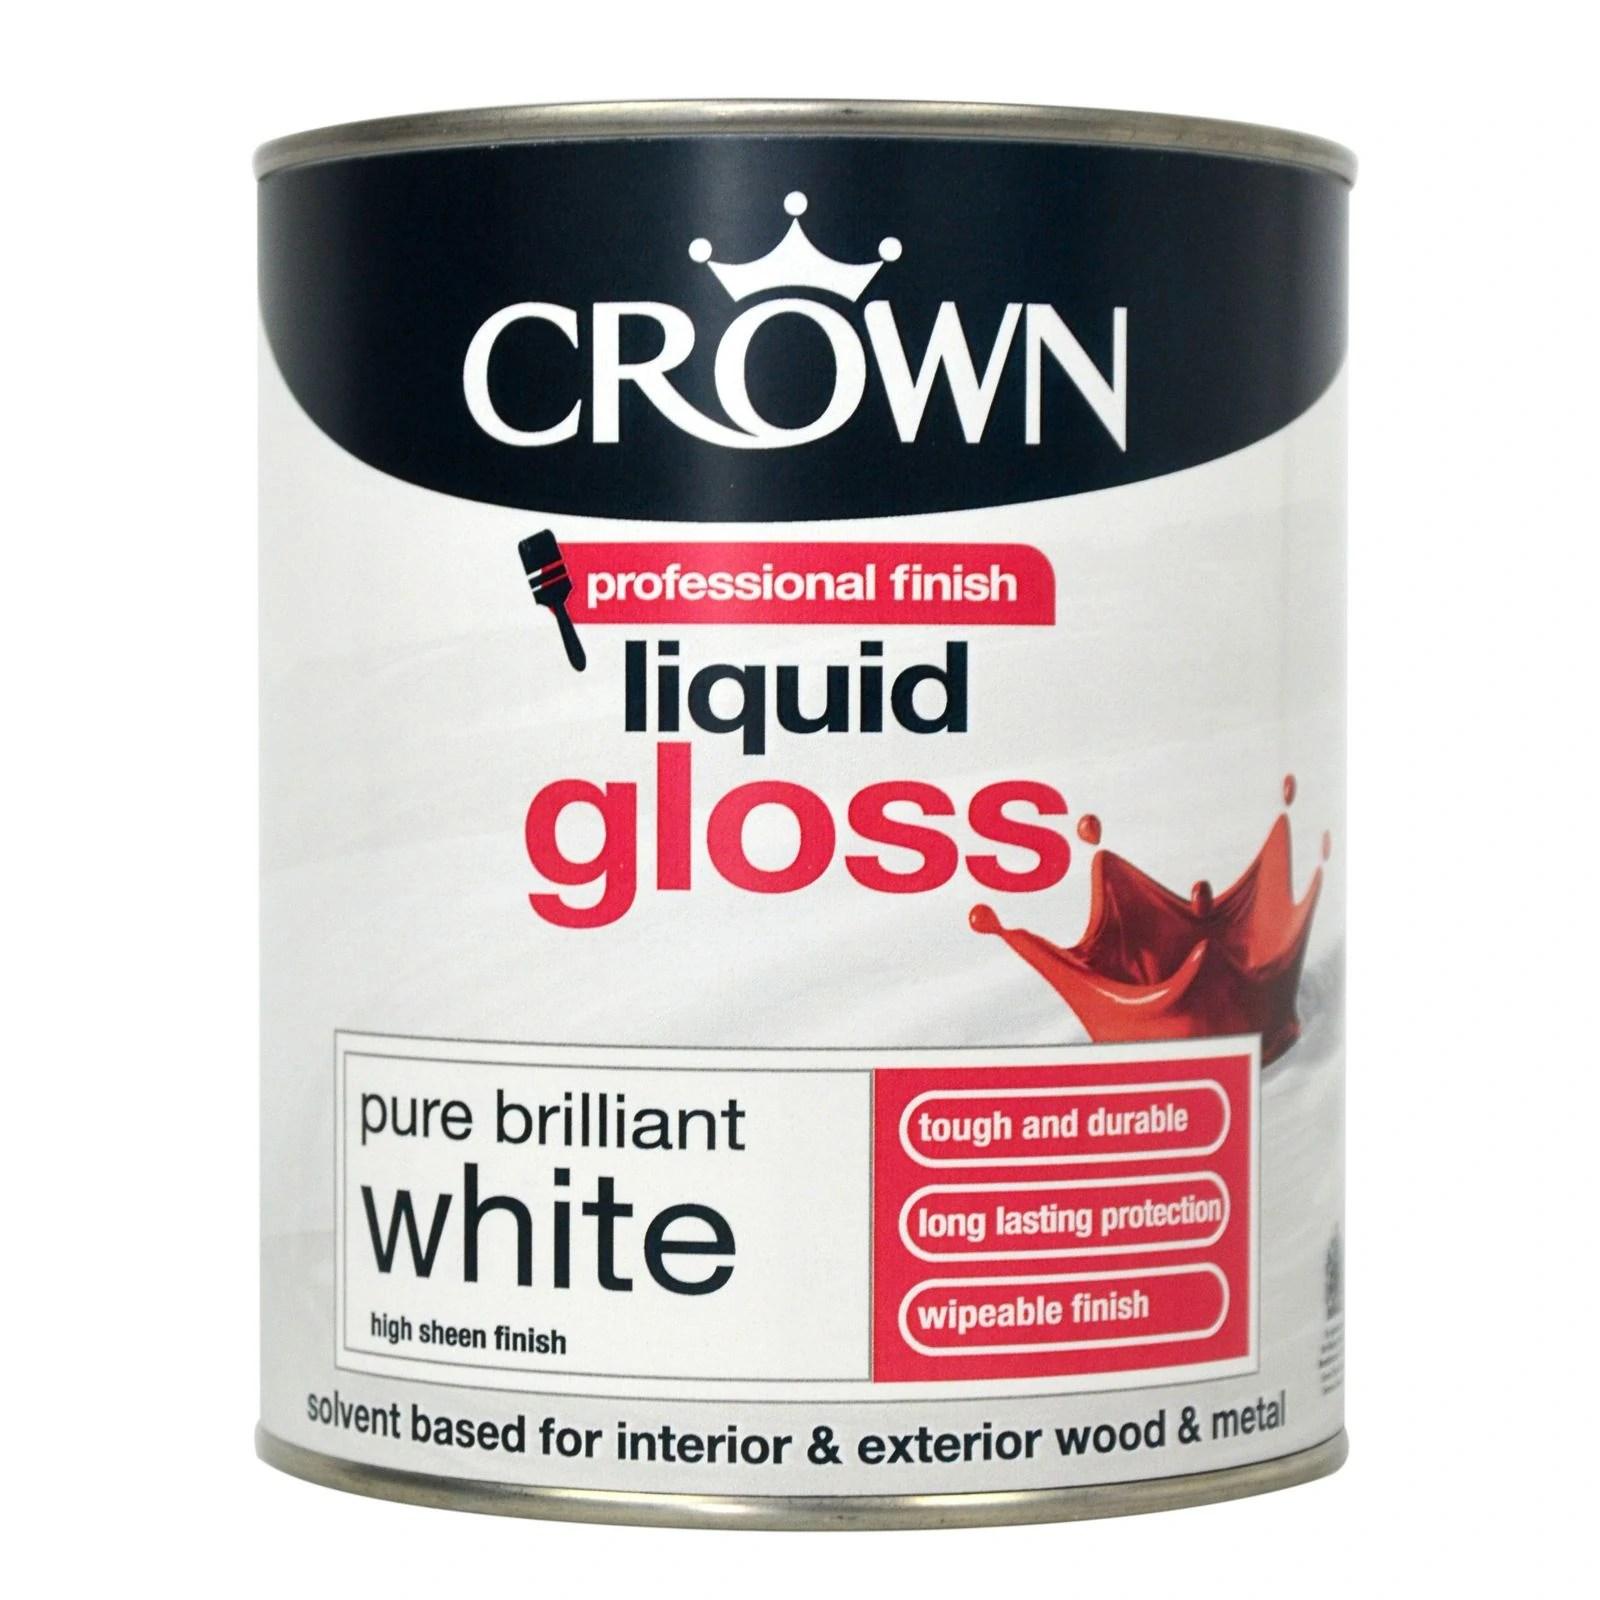 Crown-Liquid-Gloss-Brilliant-White